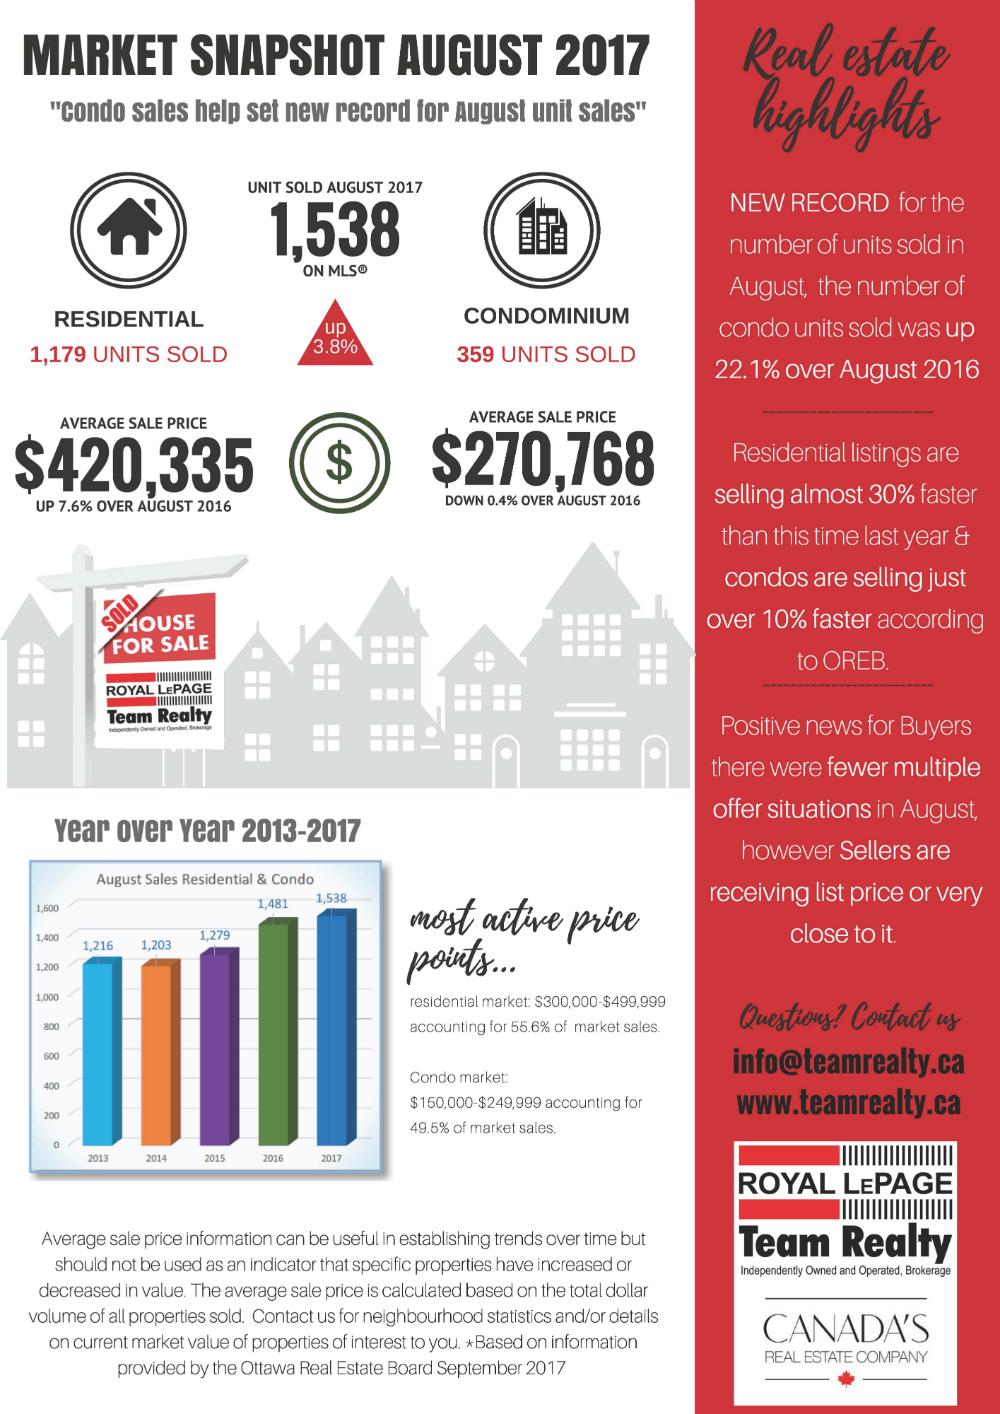 August 2017 Ottawa Real Estate hightlights